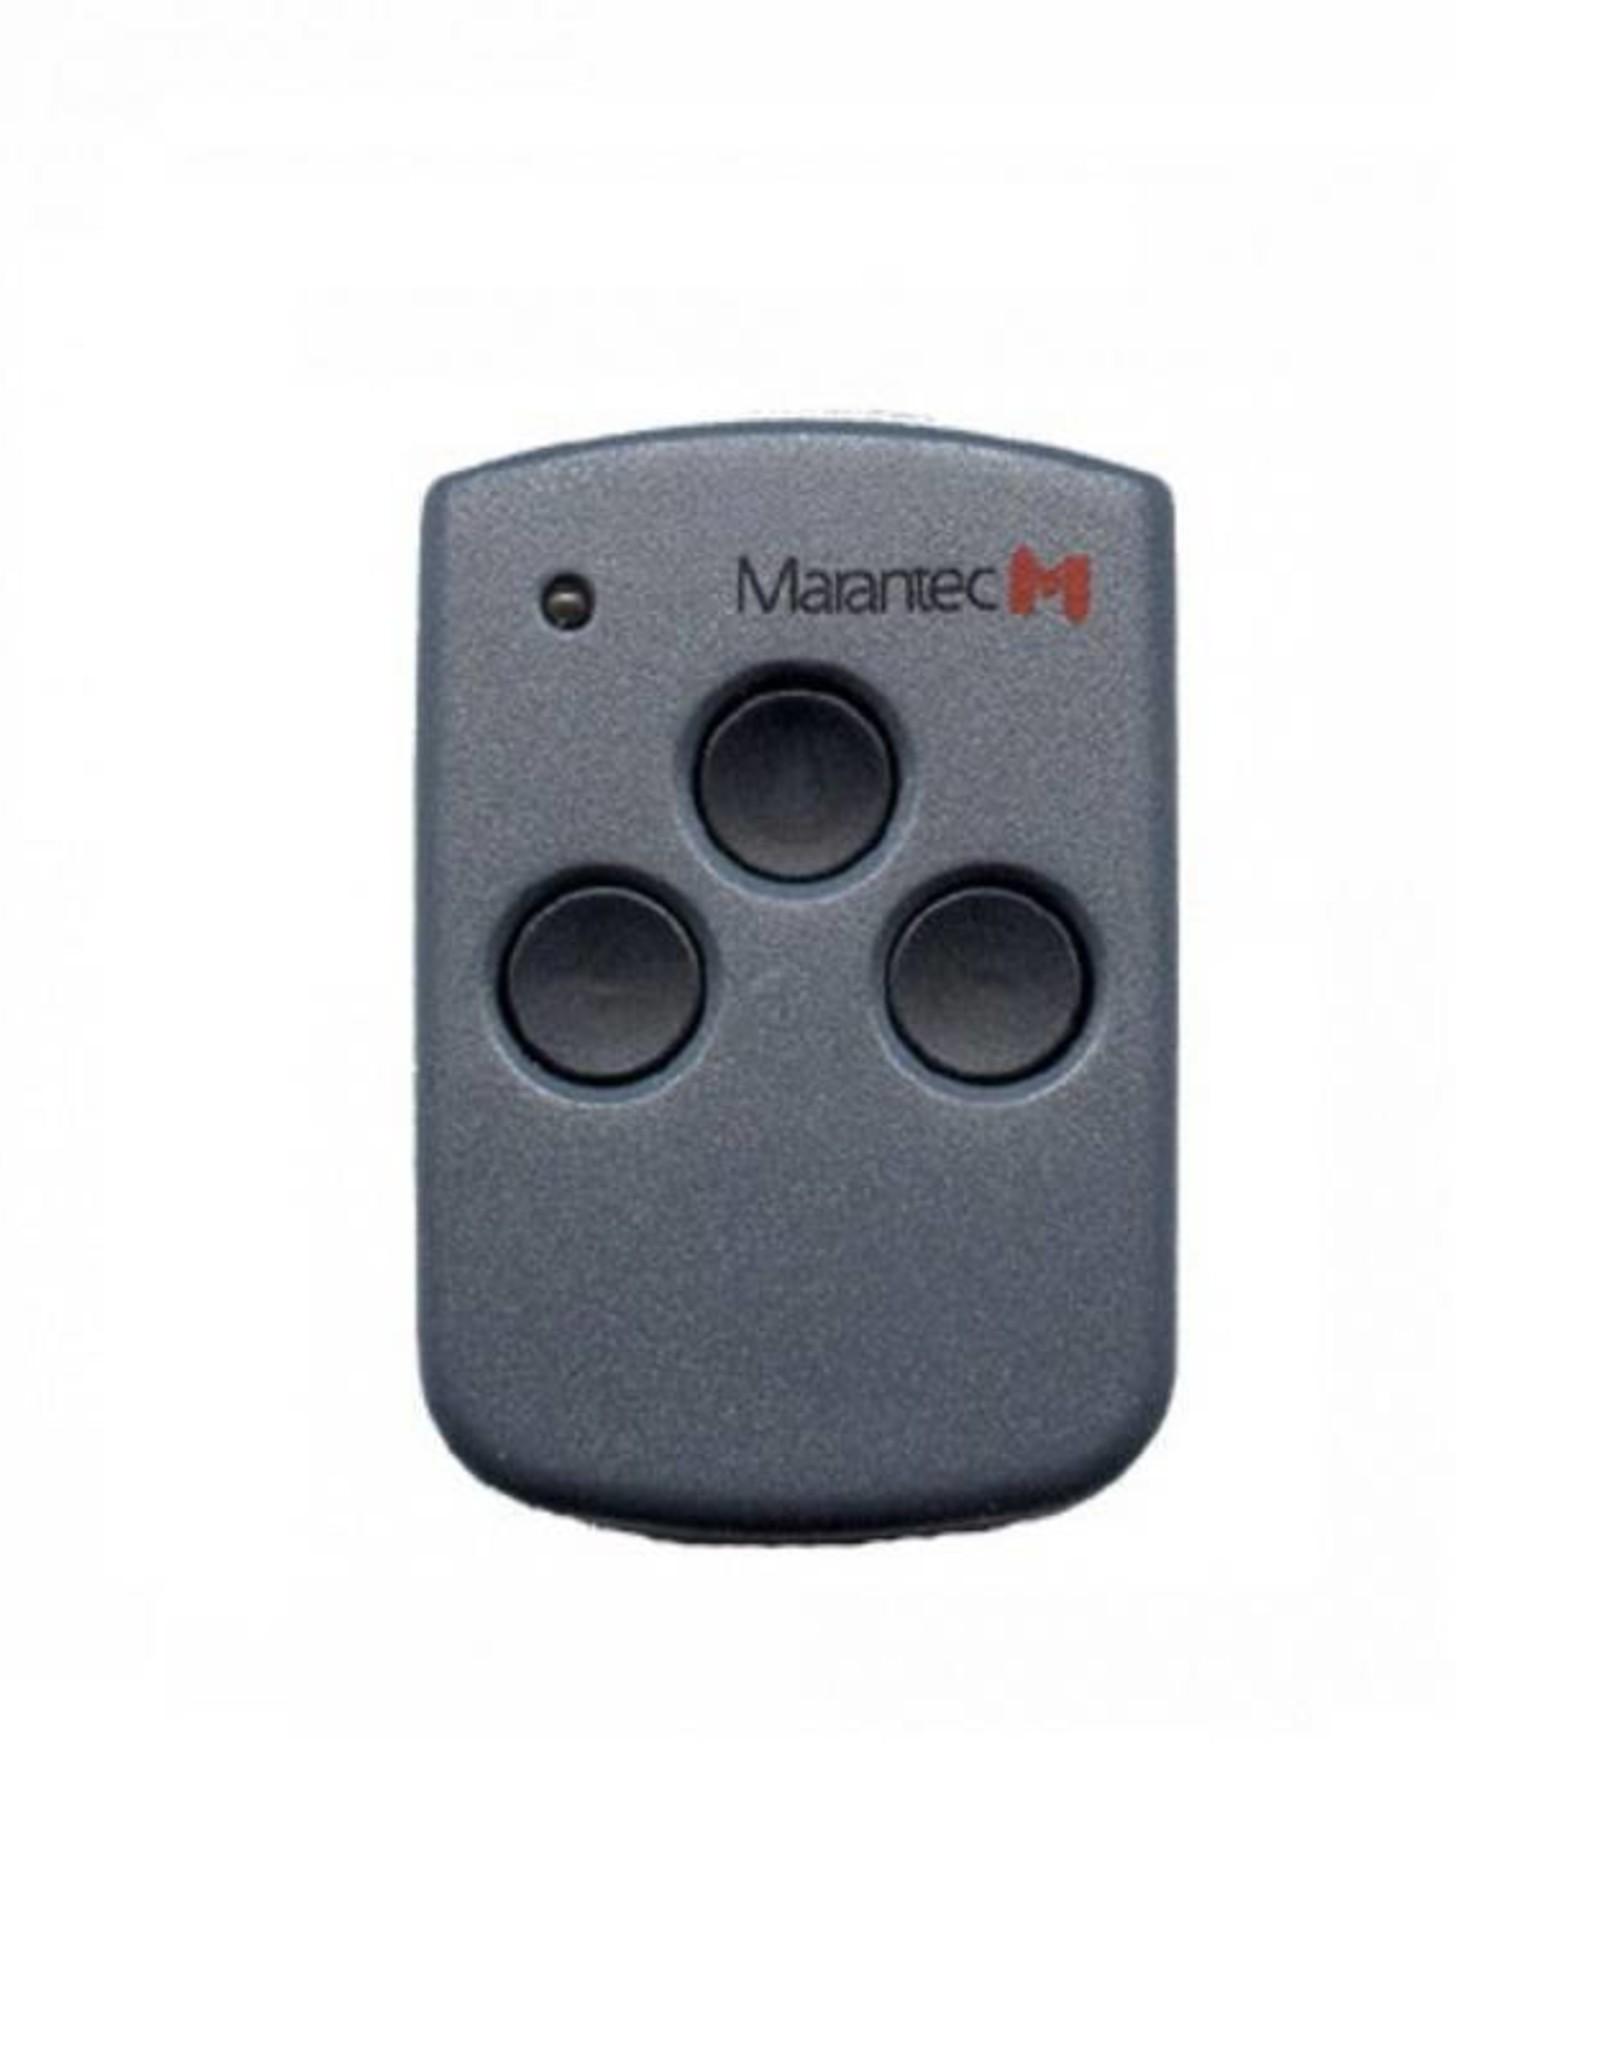 Marantec Marantec Digital 313 Multi-bit 868 MHz - 3 kanaals micro handzender